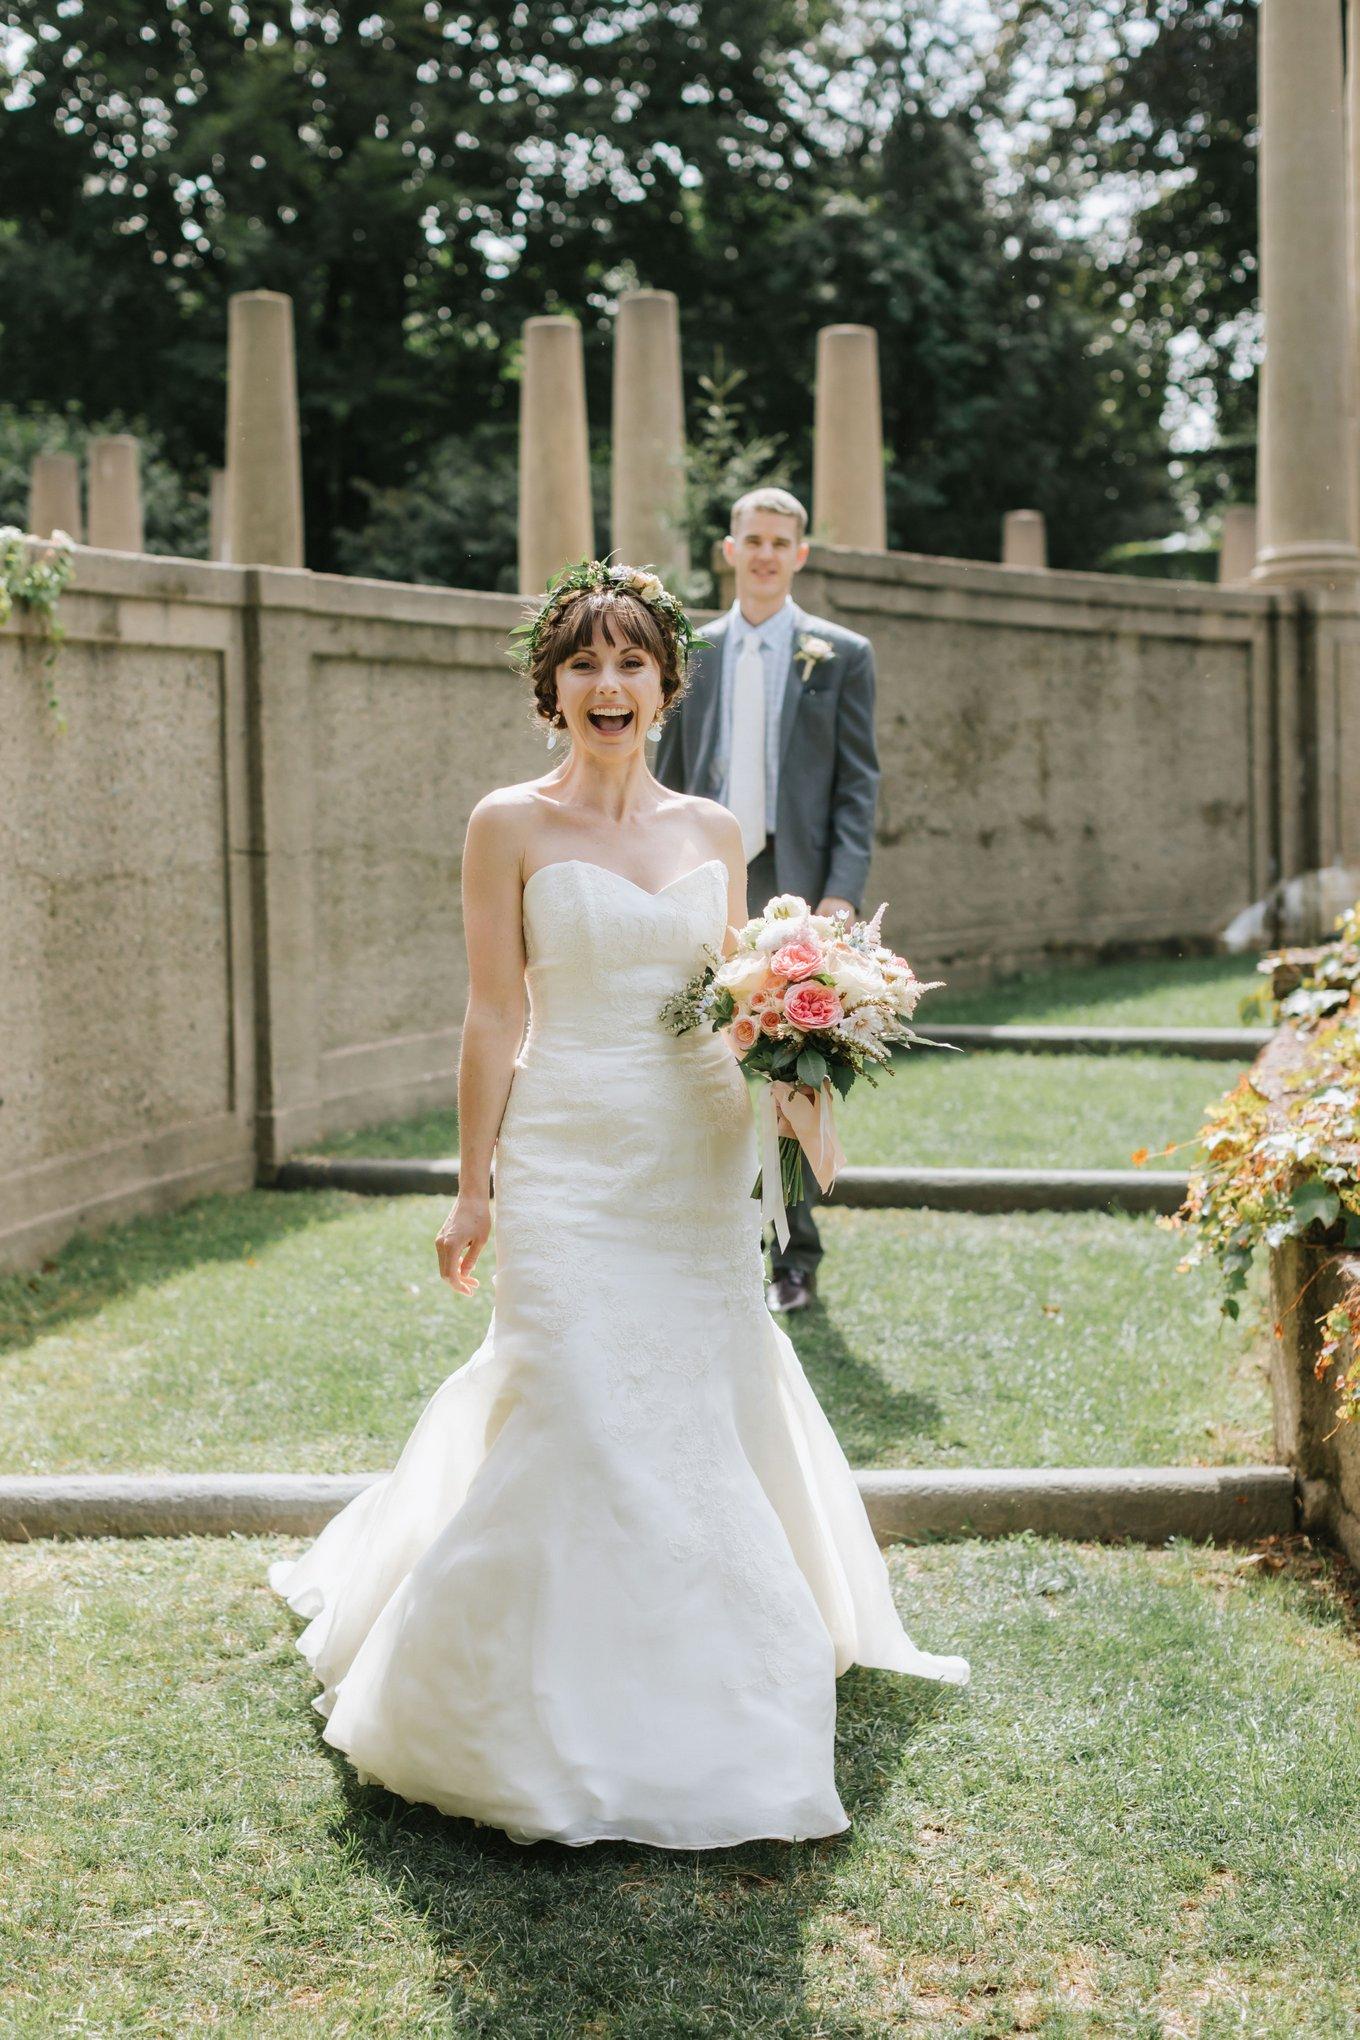 Crane-Estate-Vow-Renewal-Wedding-2.JPG